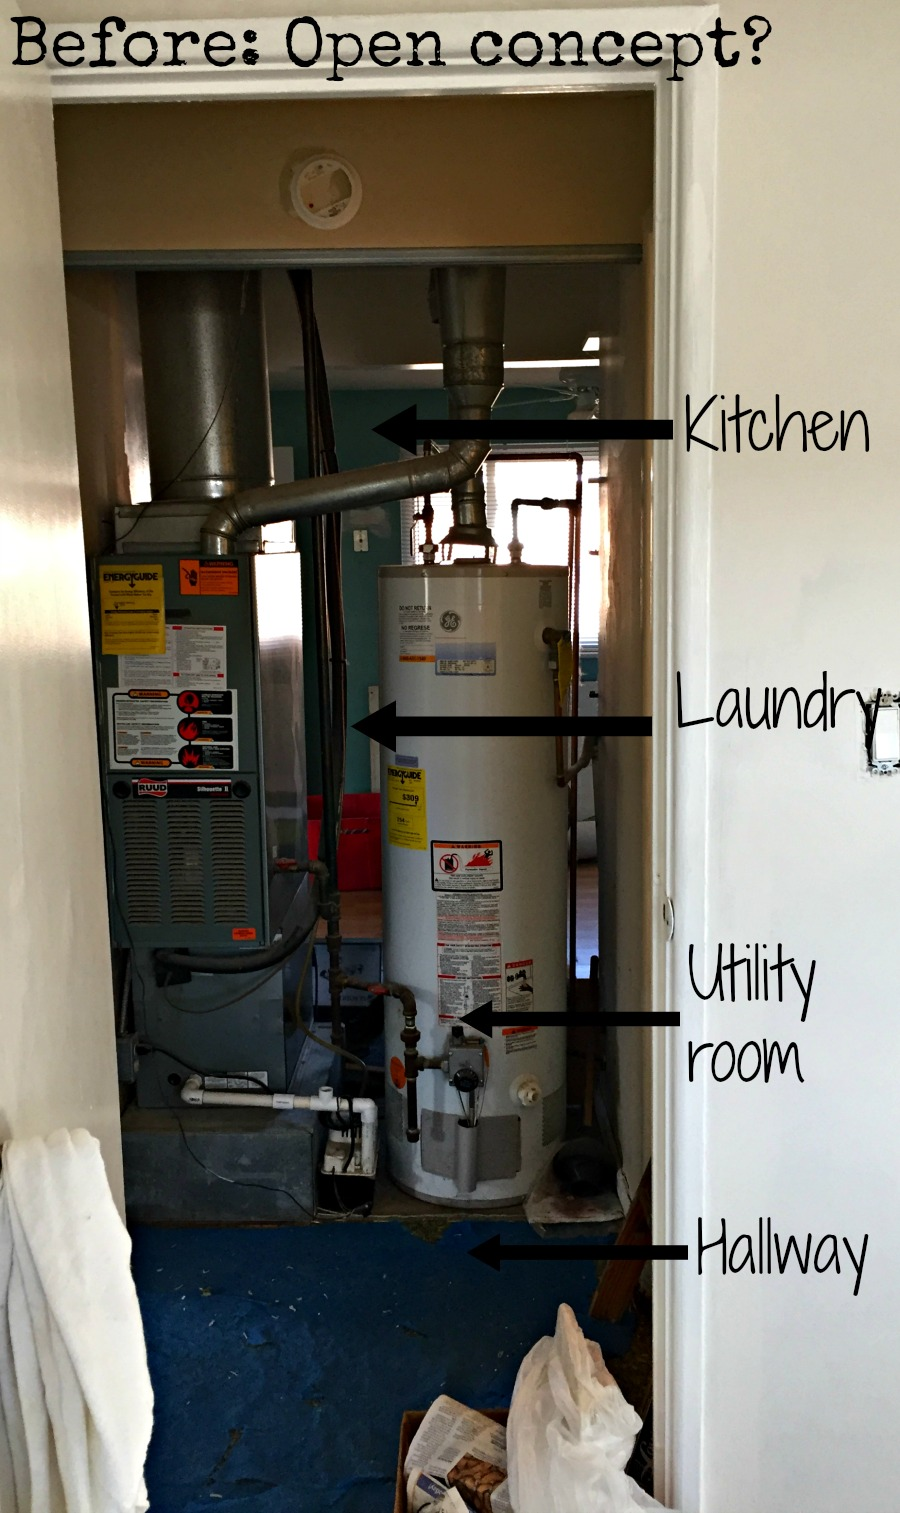 Poor design of utility room